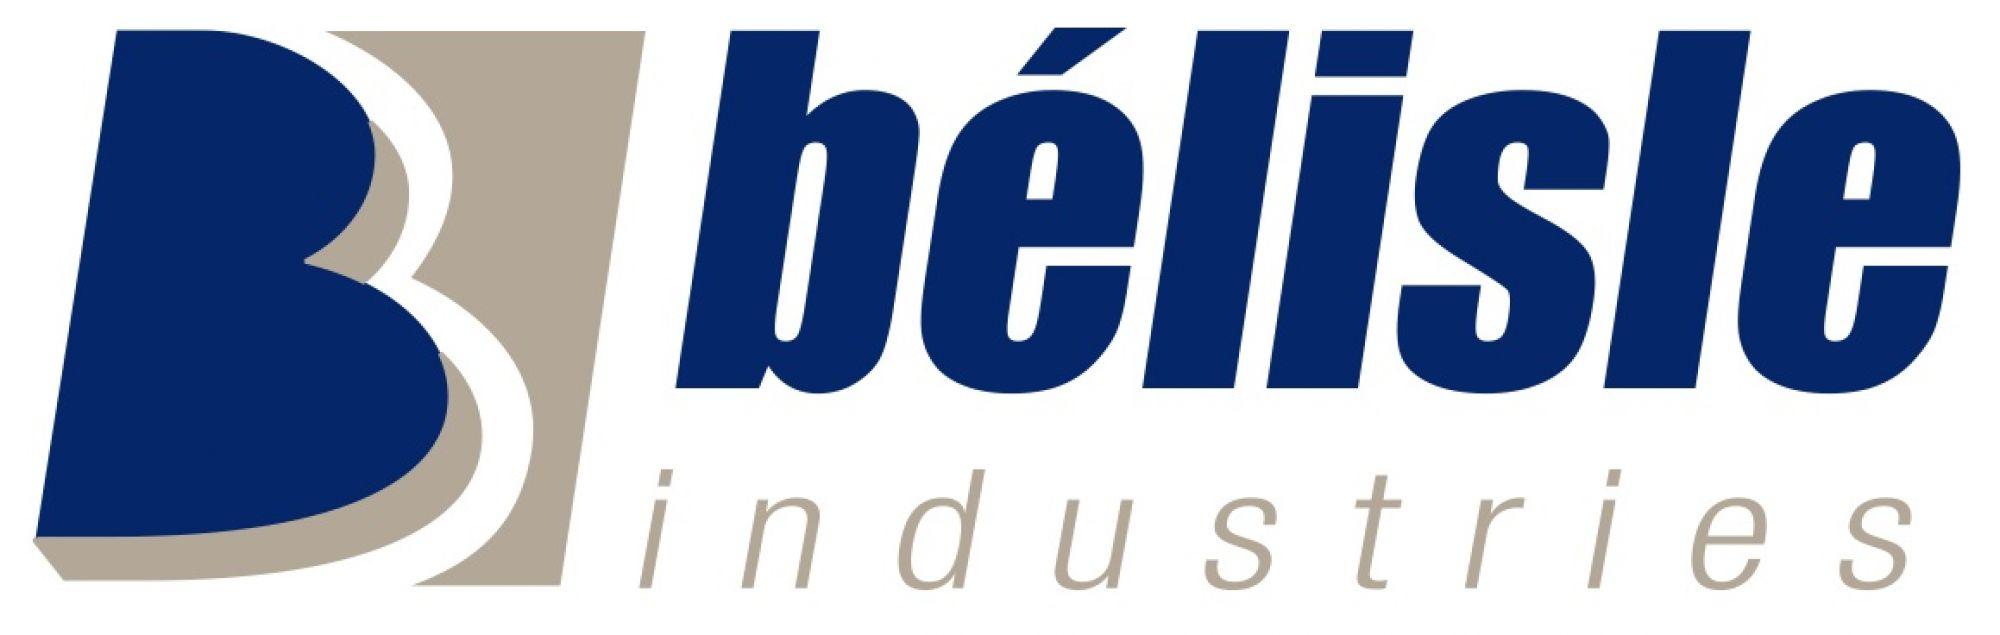 Bélisle Industries vectoriel jpg